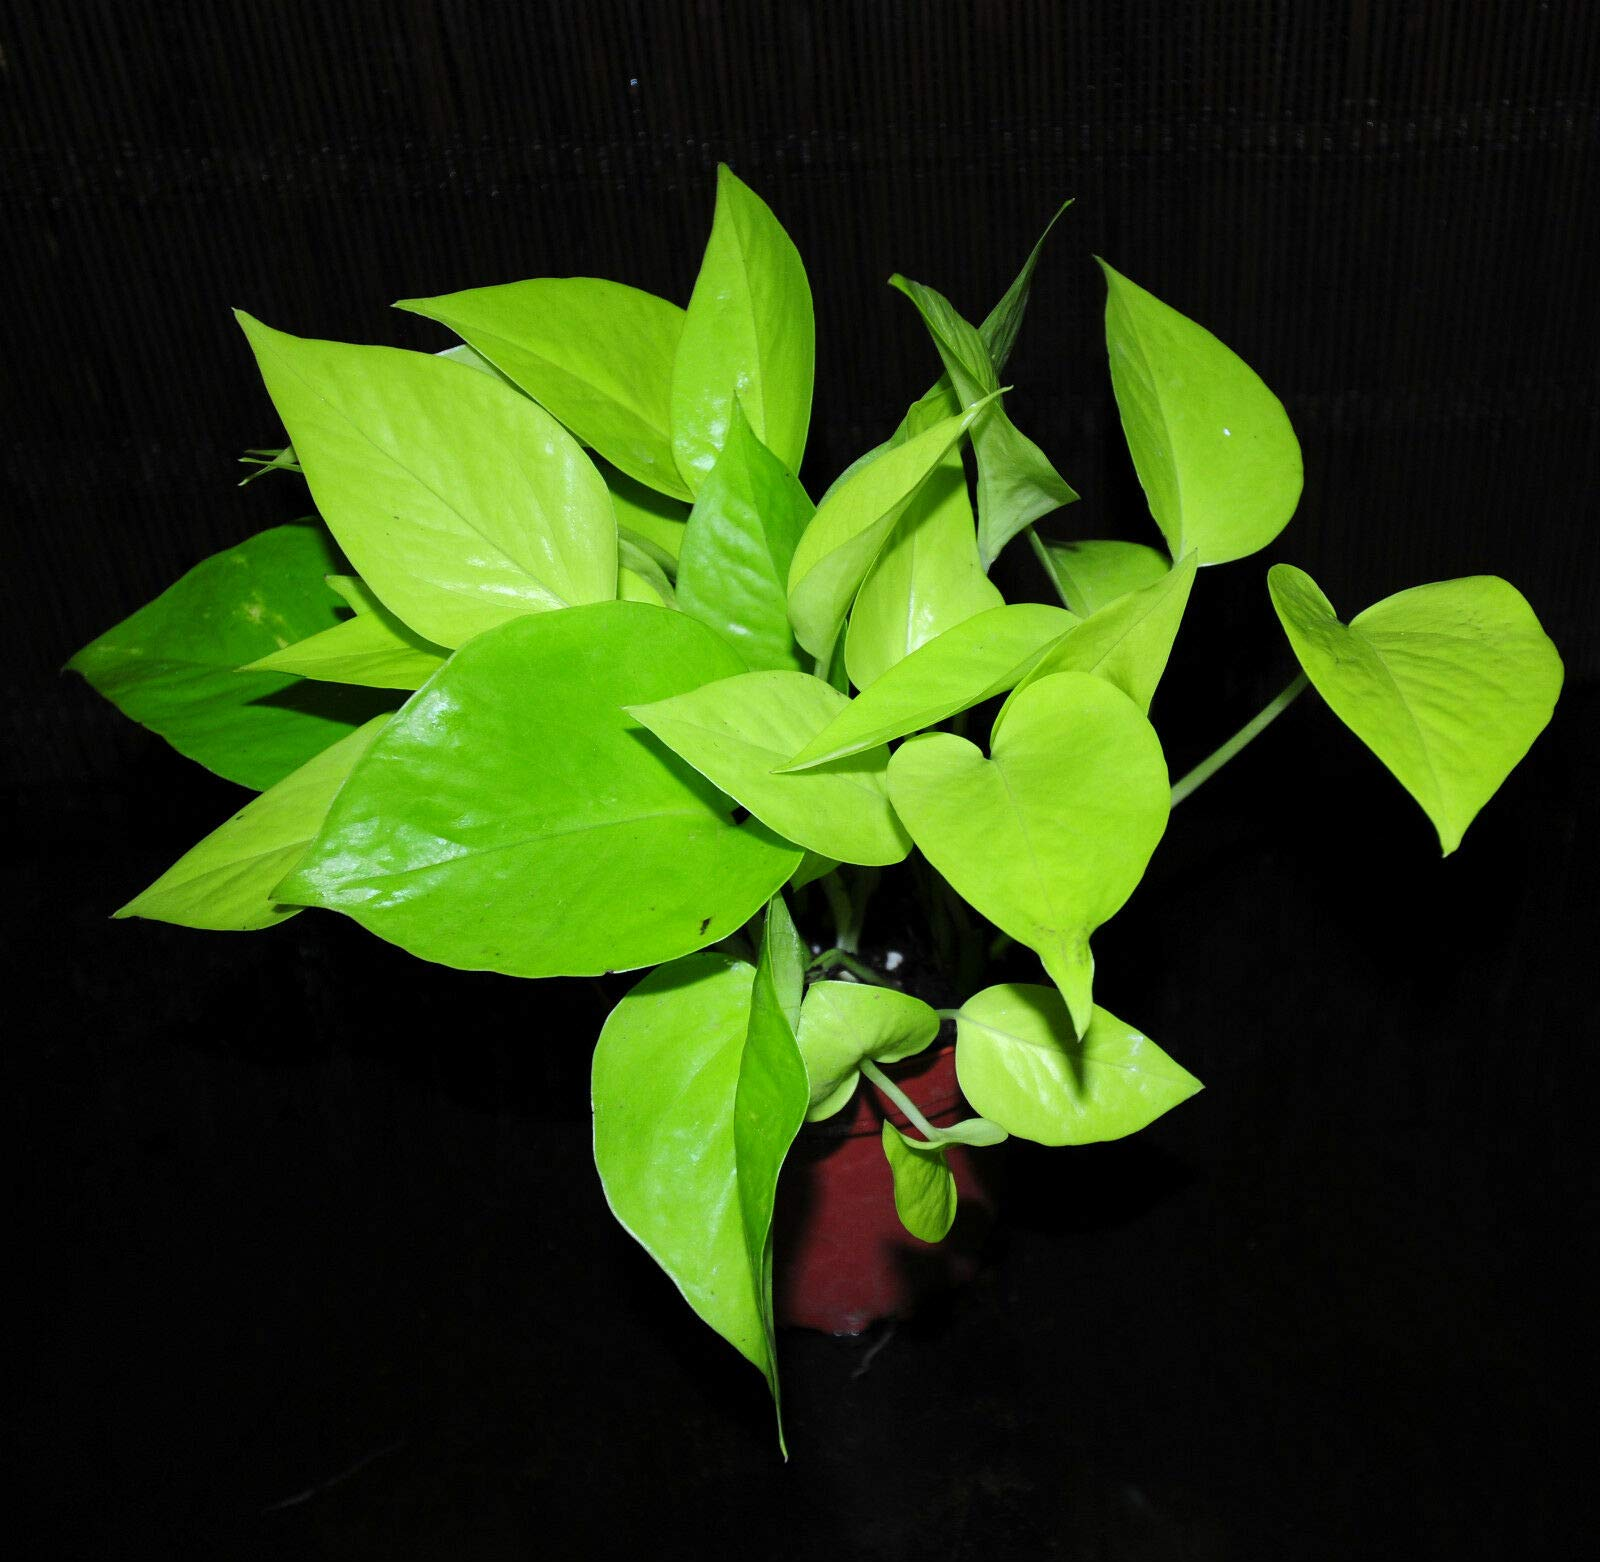 New Item 2~Neon Pothos 4'' Pot Epipremnum aureum Neon Beautiful Chartreuse Leaves (Premium Quality) by AY-Premium